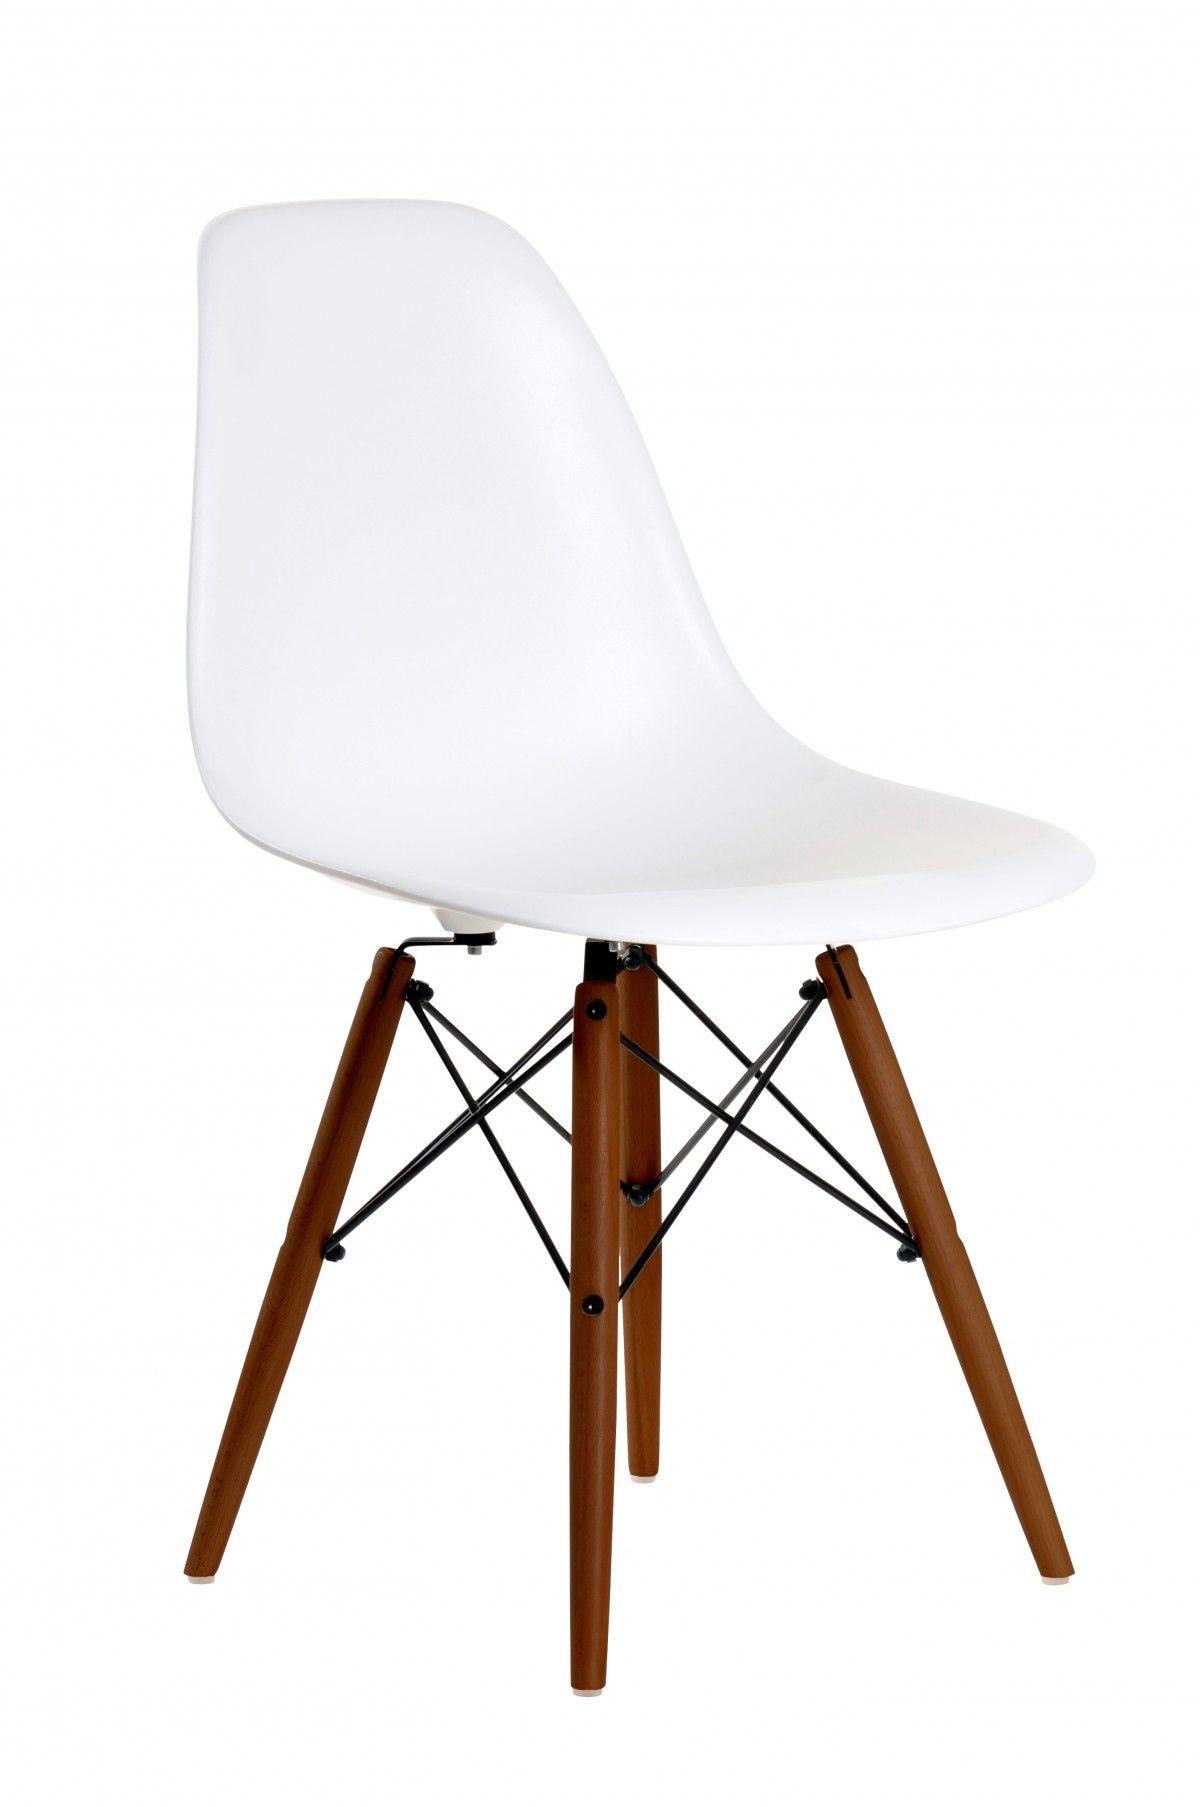 Eames DSW style chair / Walnut Base - Stühle - Stühle   Goodfurn ...